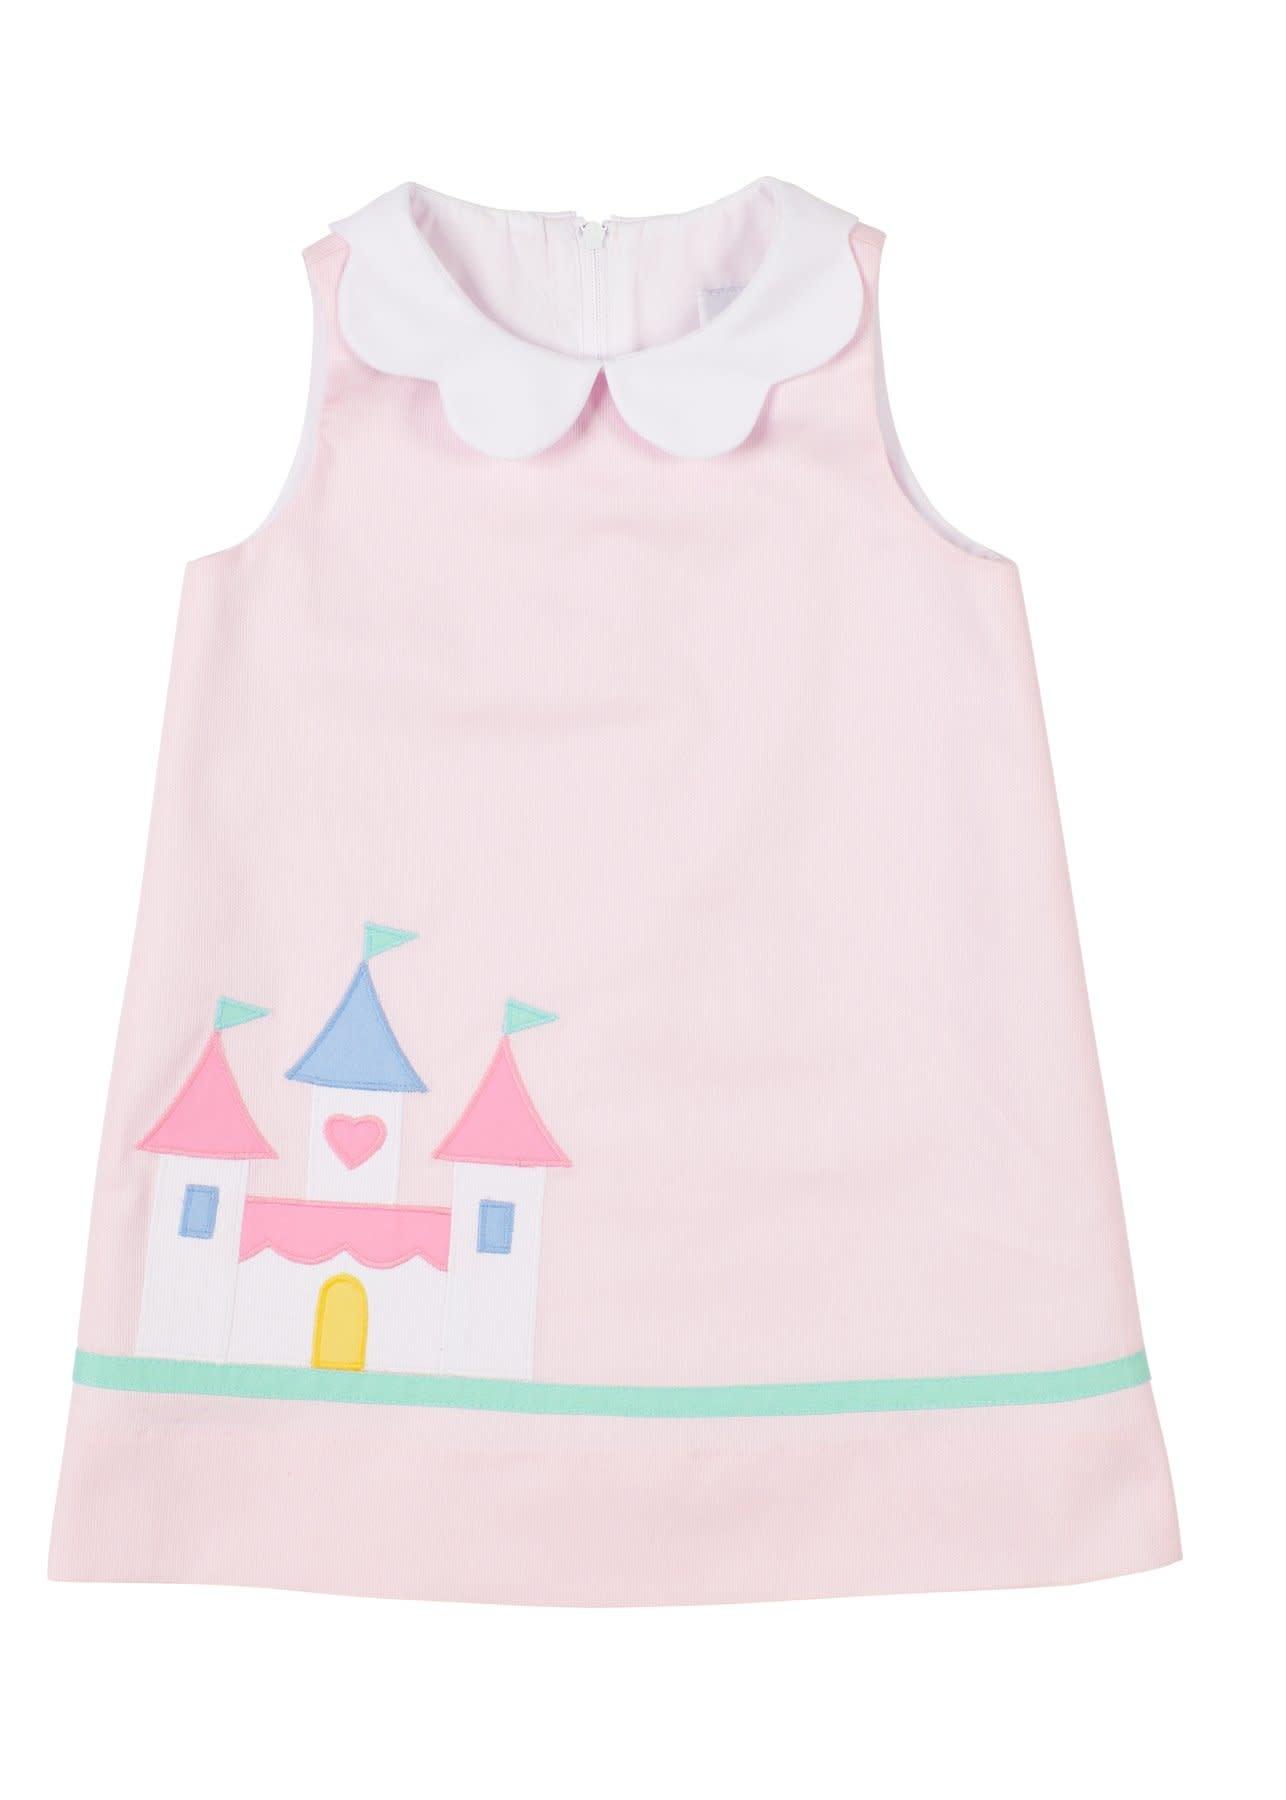 Florence Eiseman Princess Castle Pink Dress